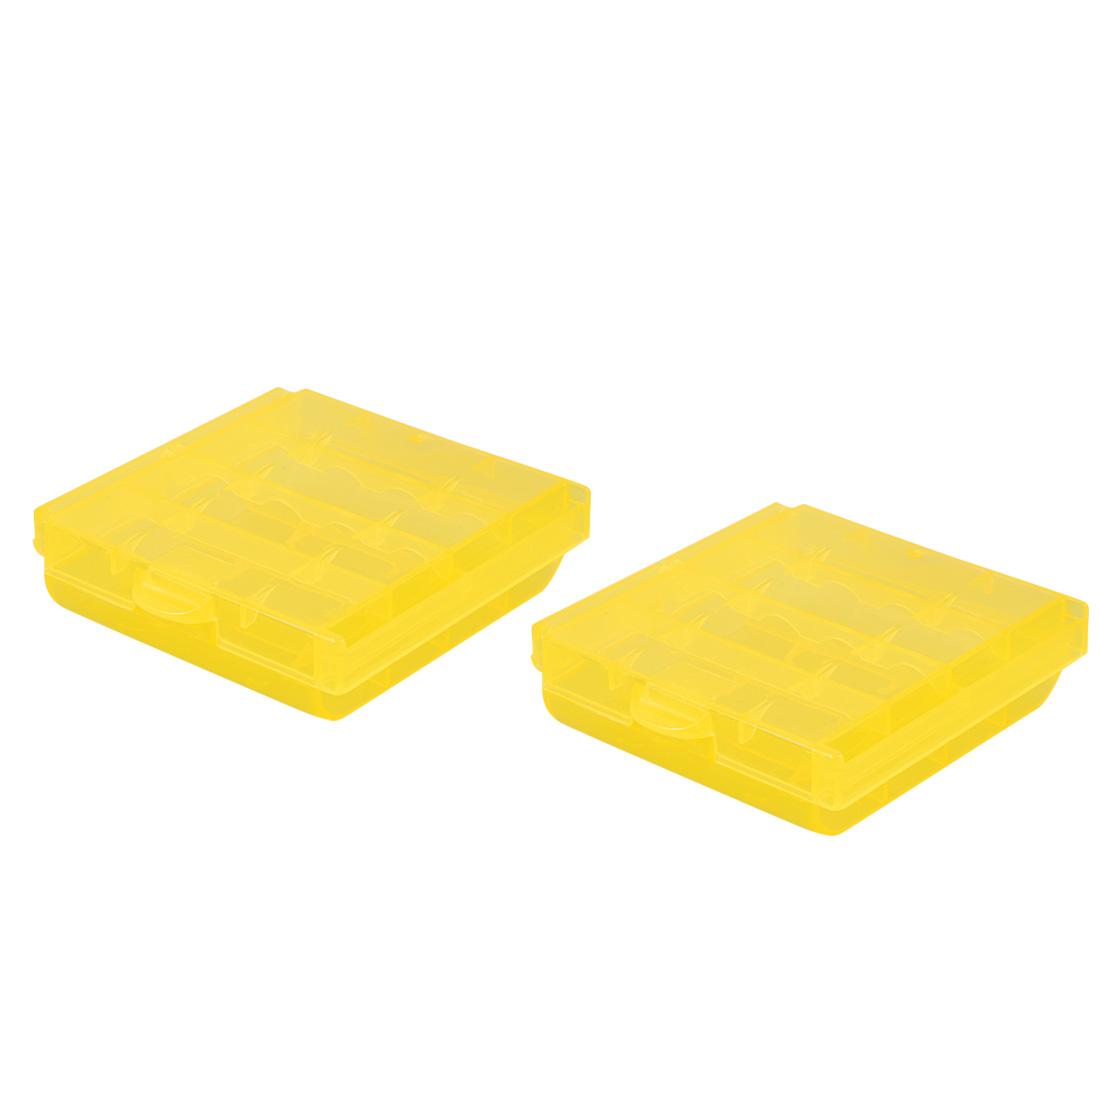 2 Pcs Battery Storage Case Holder Yellow 4AA or 4AAA Battery Capacity